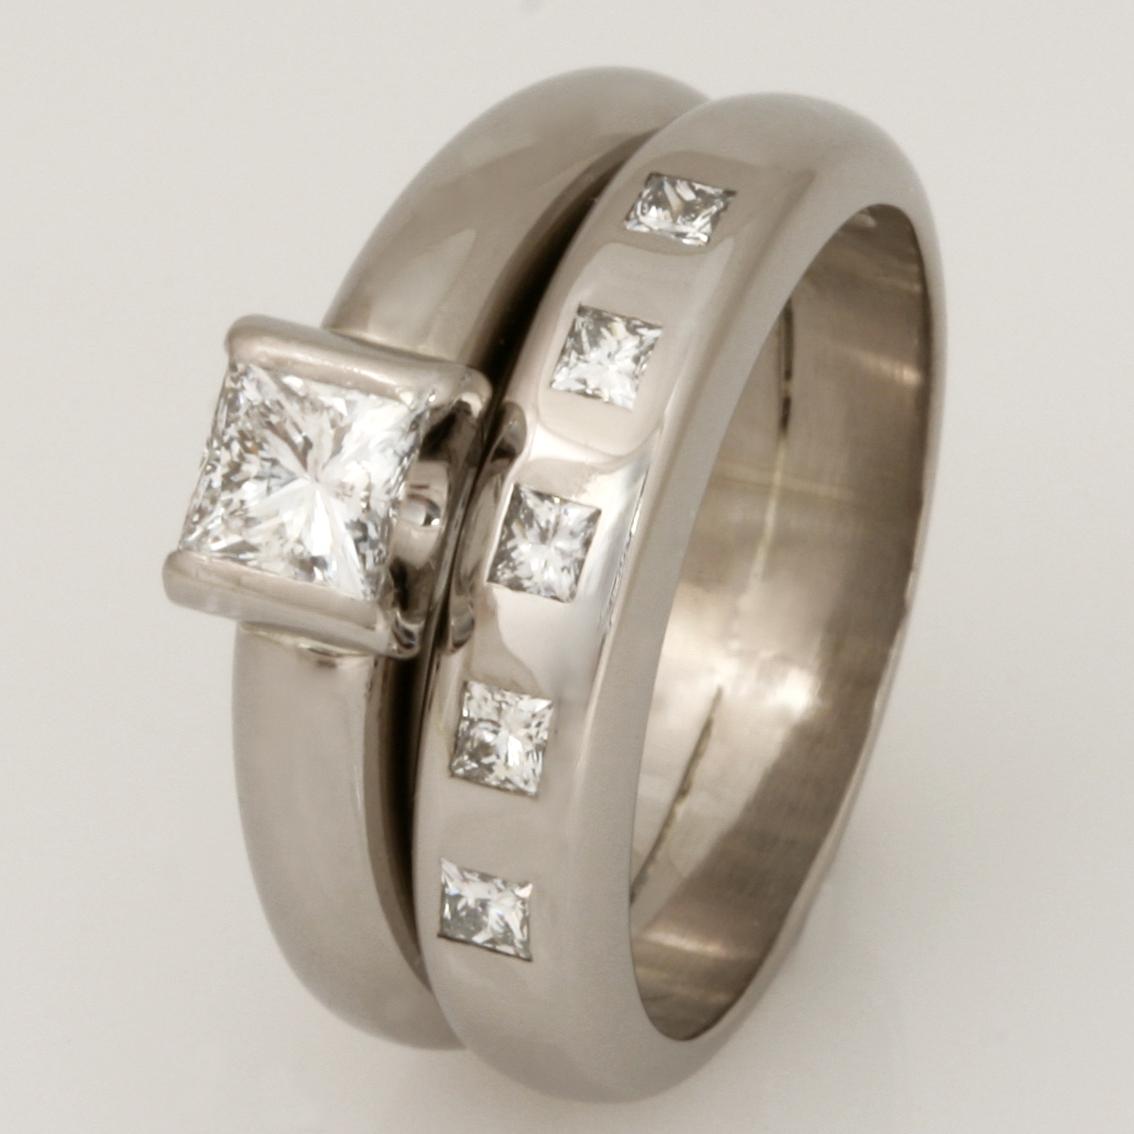 Handmade ladies 18ct white gold princess cut diamond eternity ring